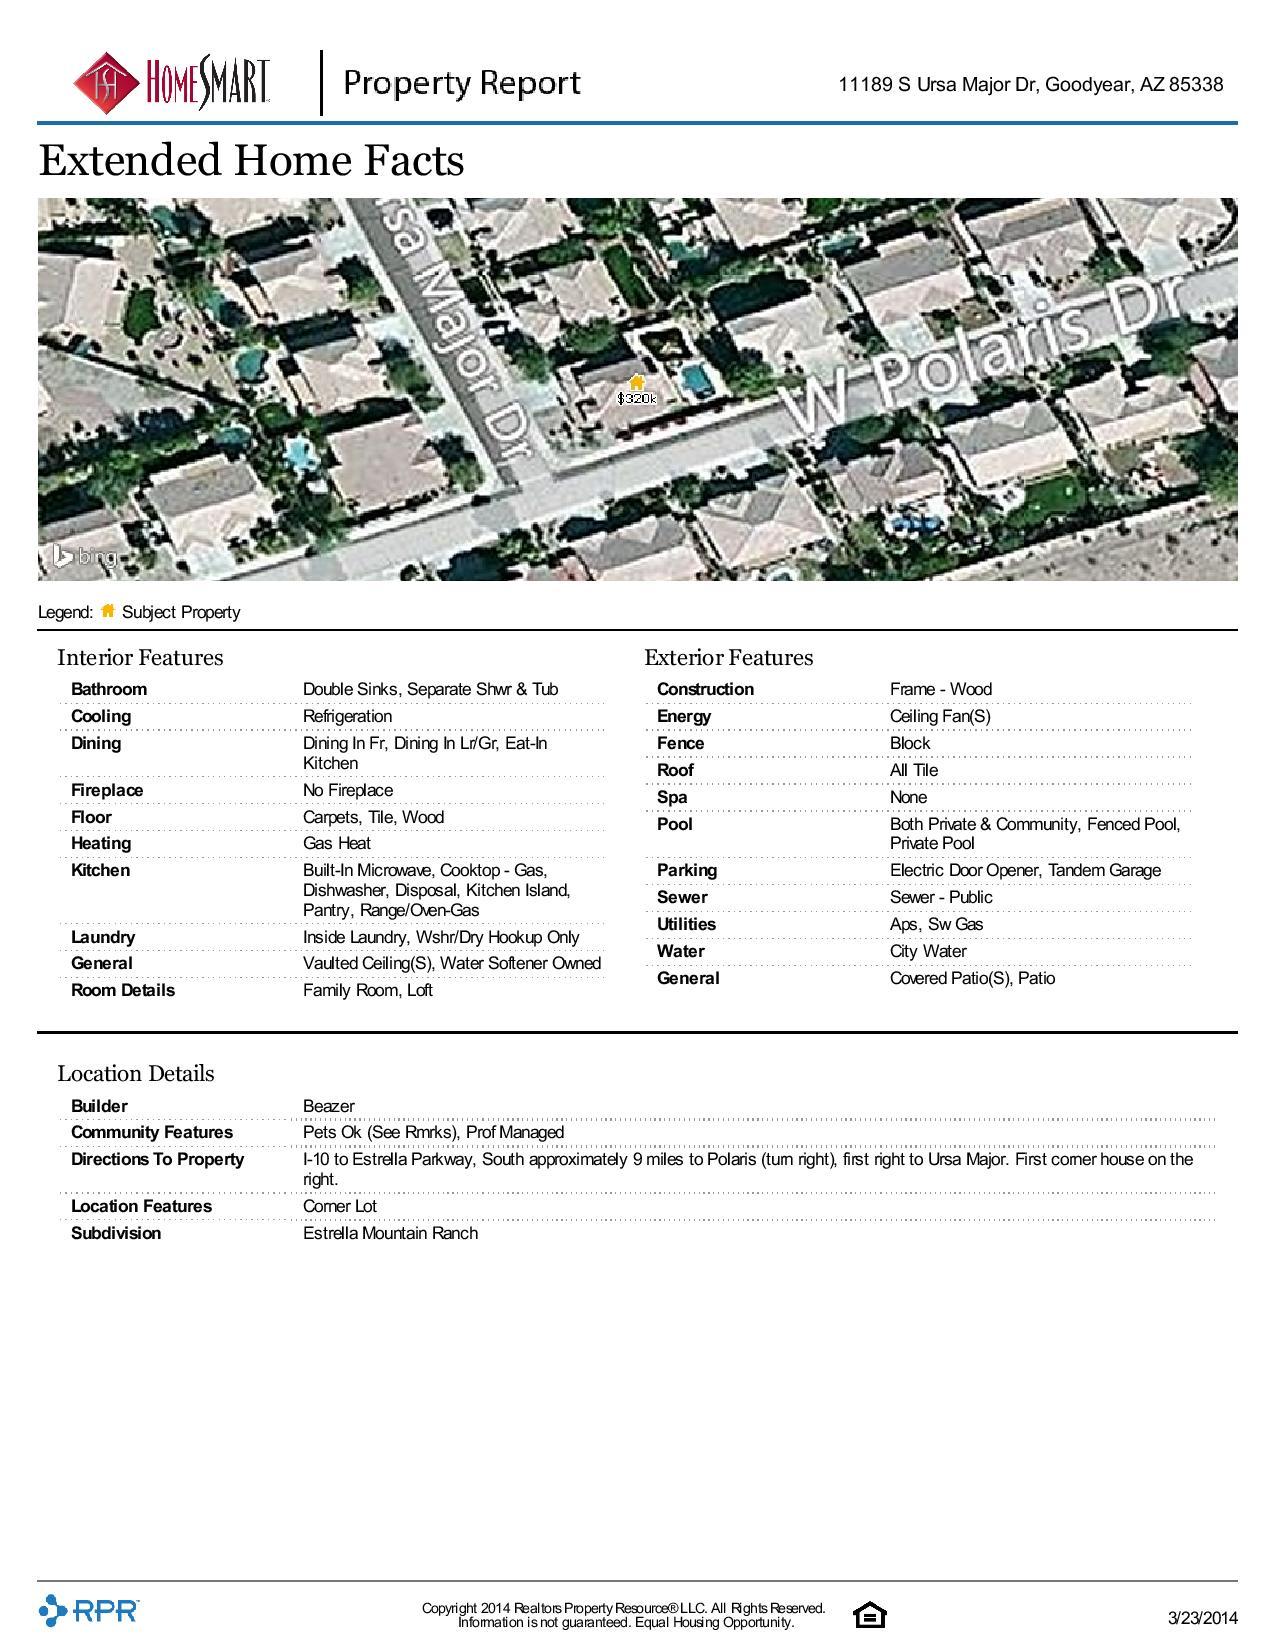 11189-S-Ursa-Major-Dr-Goodyear-AZ-85338-page-004